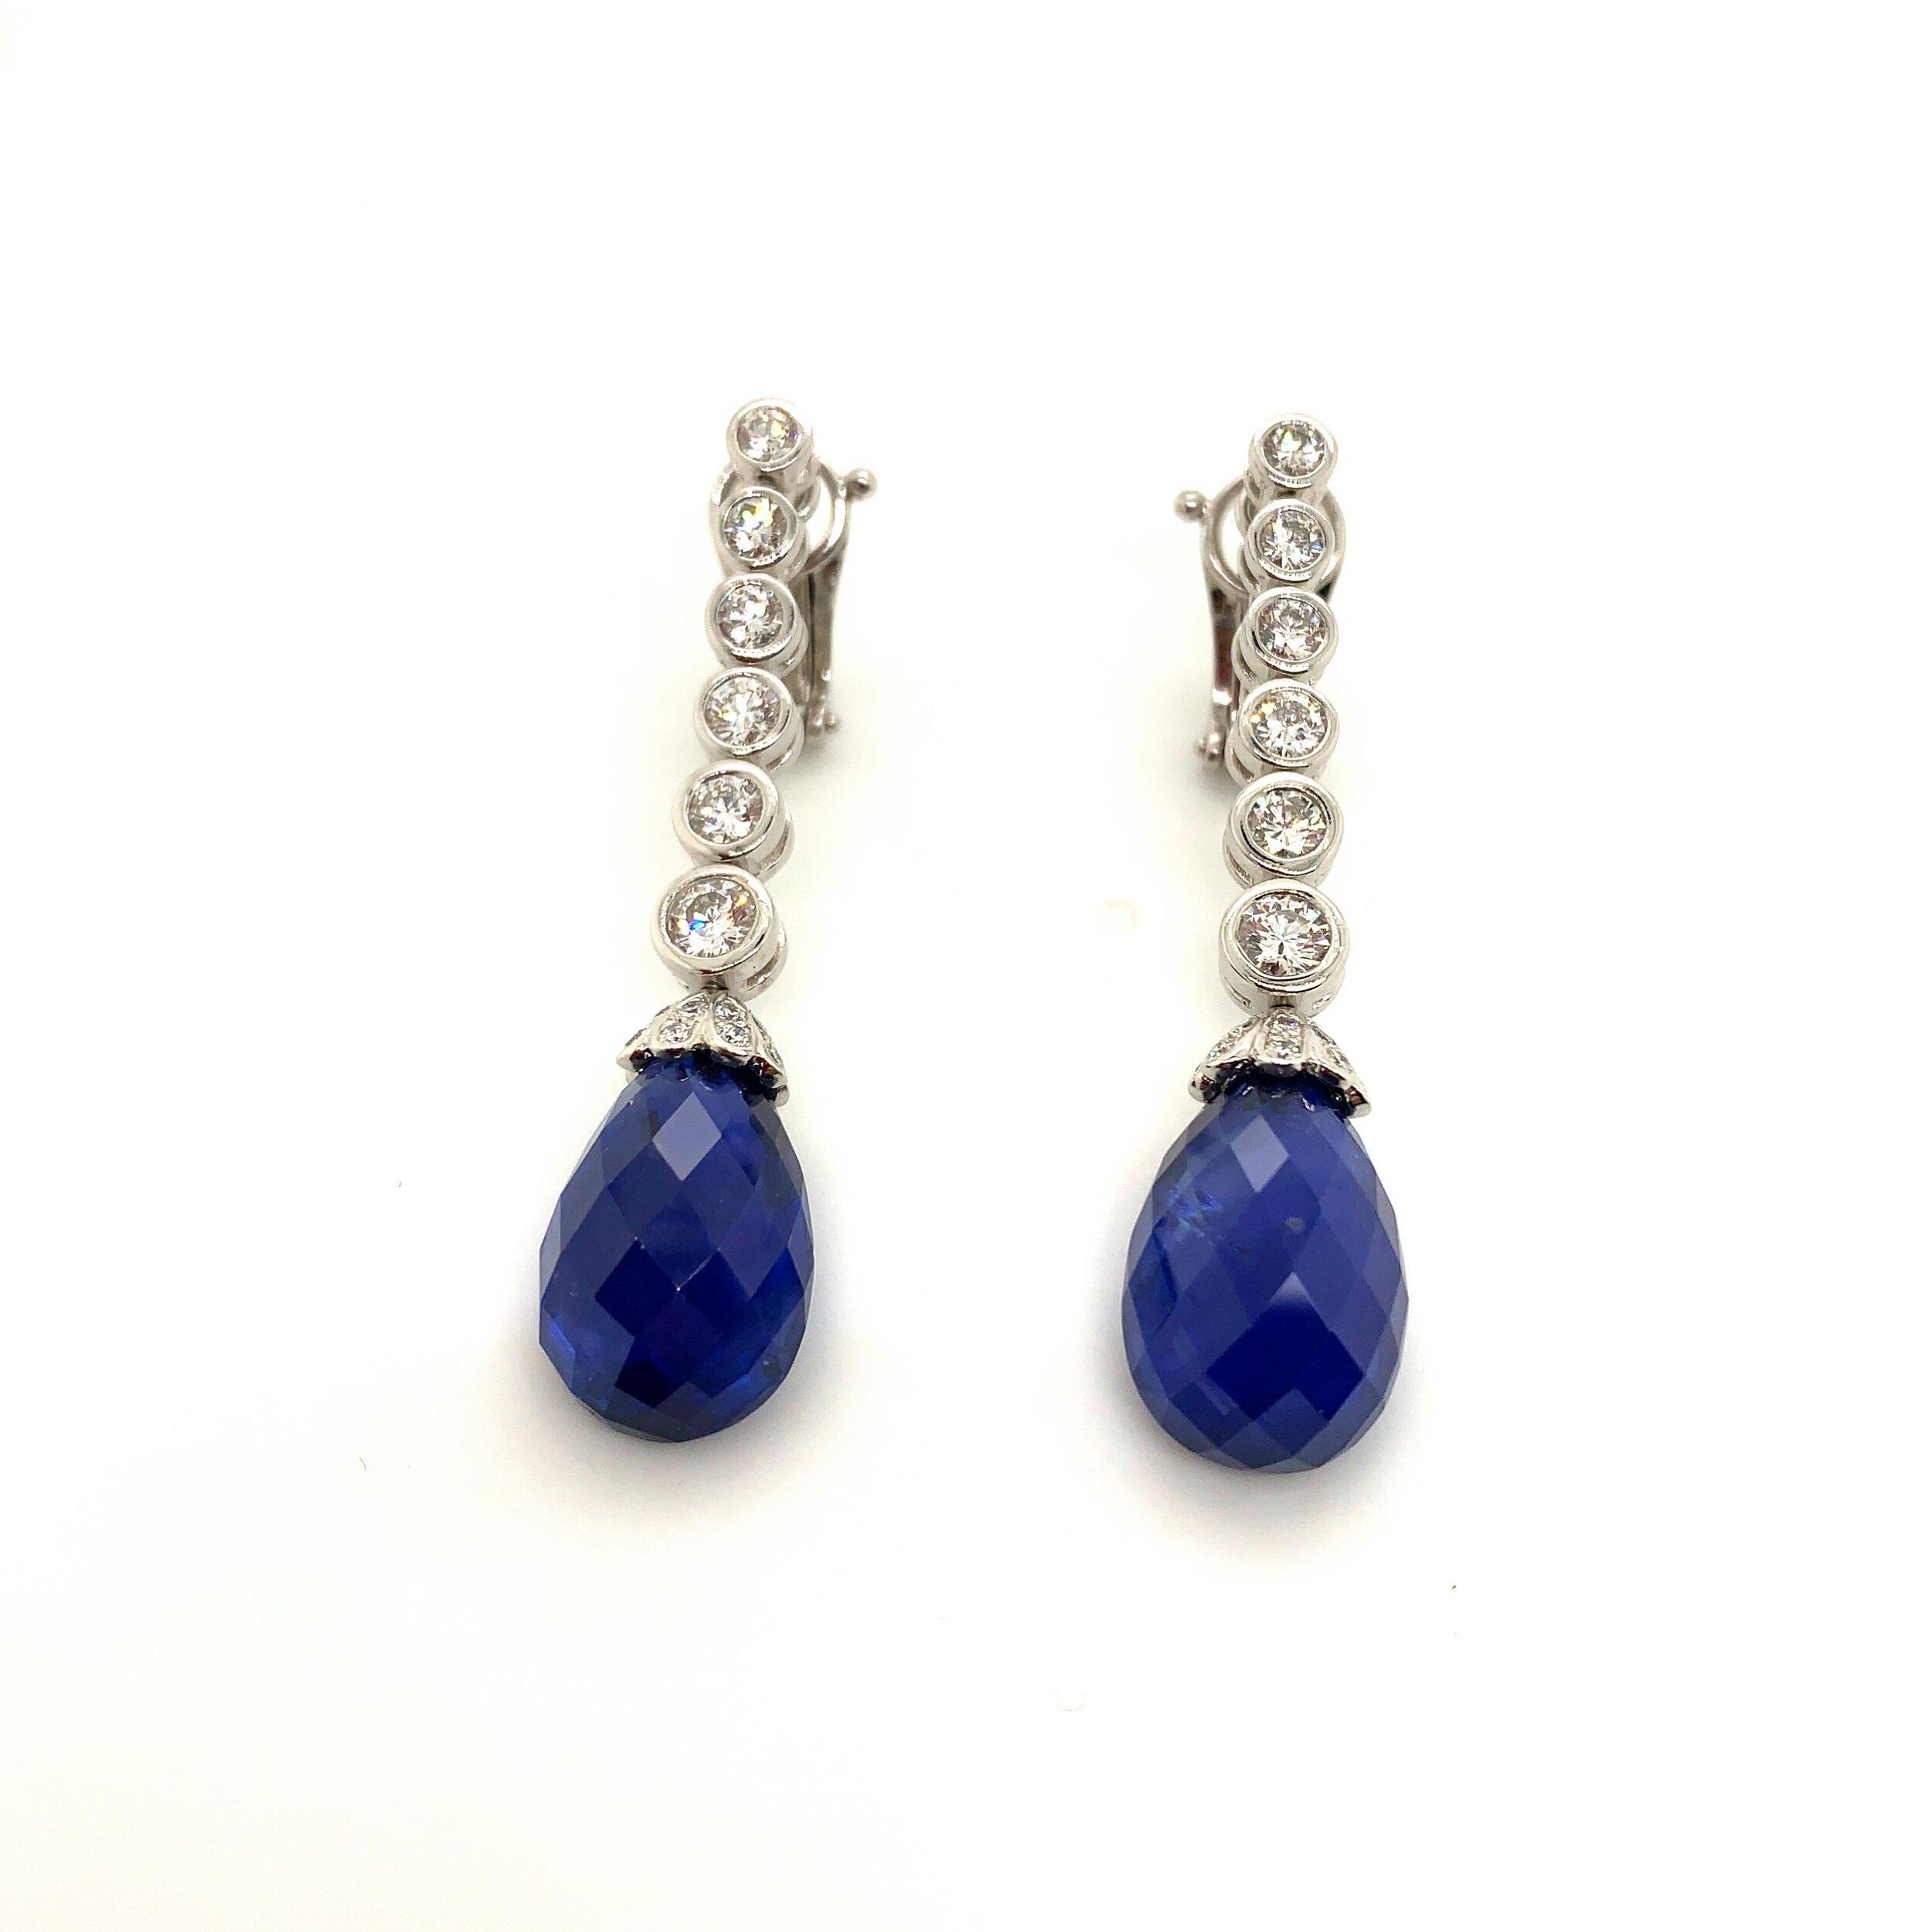 2-2.5ct Sapphire Briollette Drop Earrings with Diamonds, Van Cleef & Arpels   Est. US$ 35,000-45,000